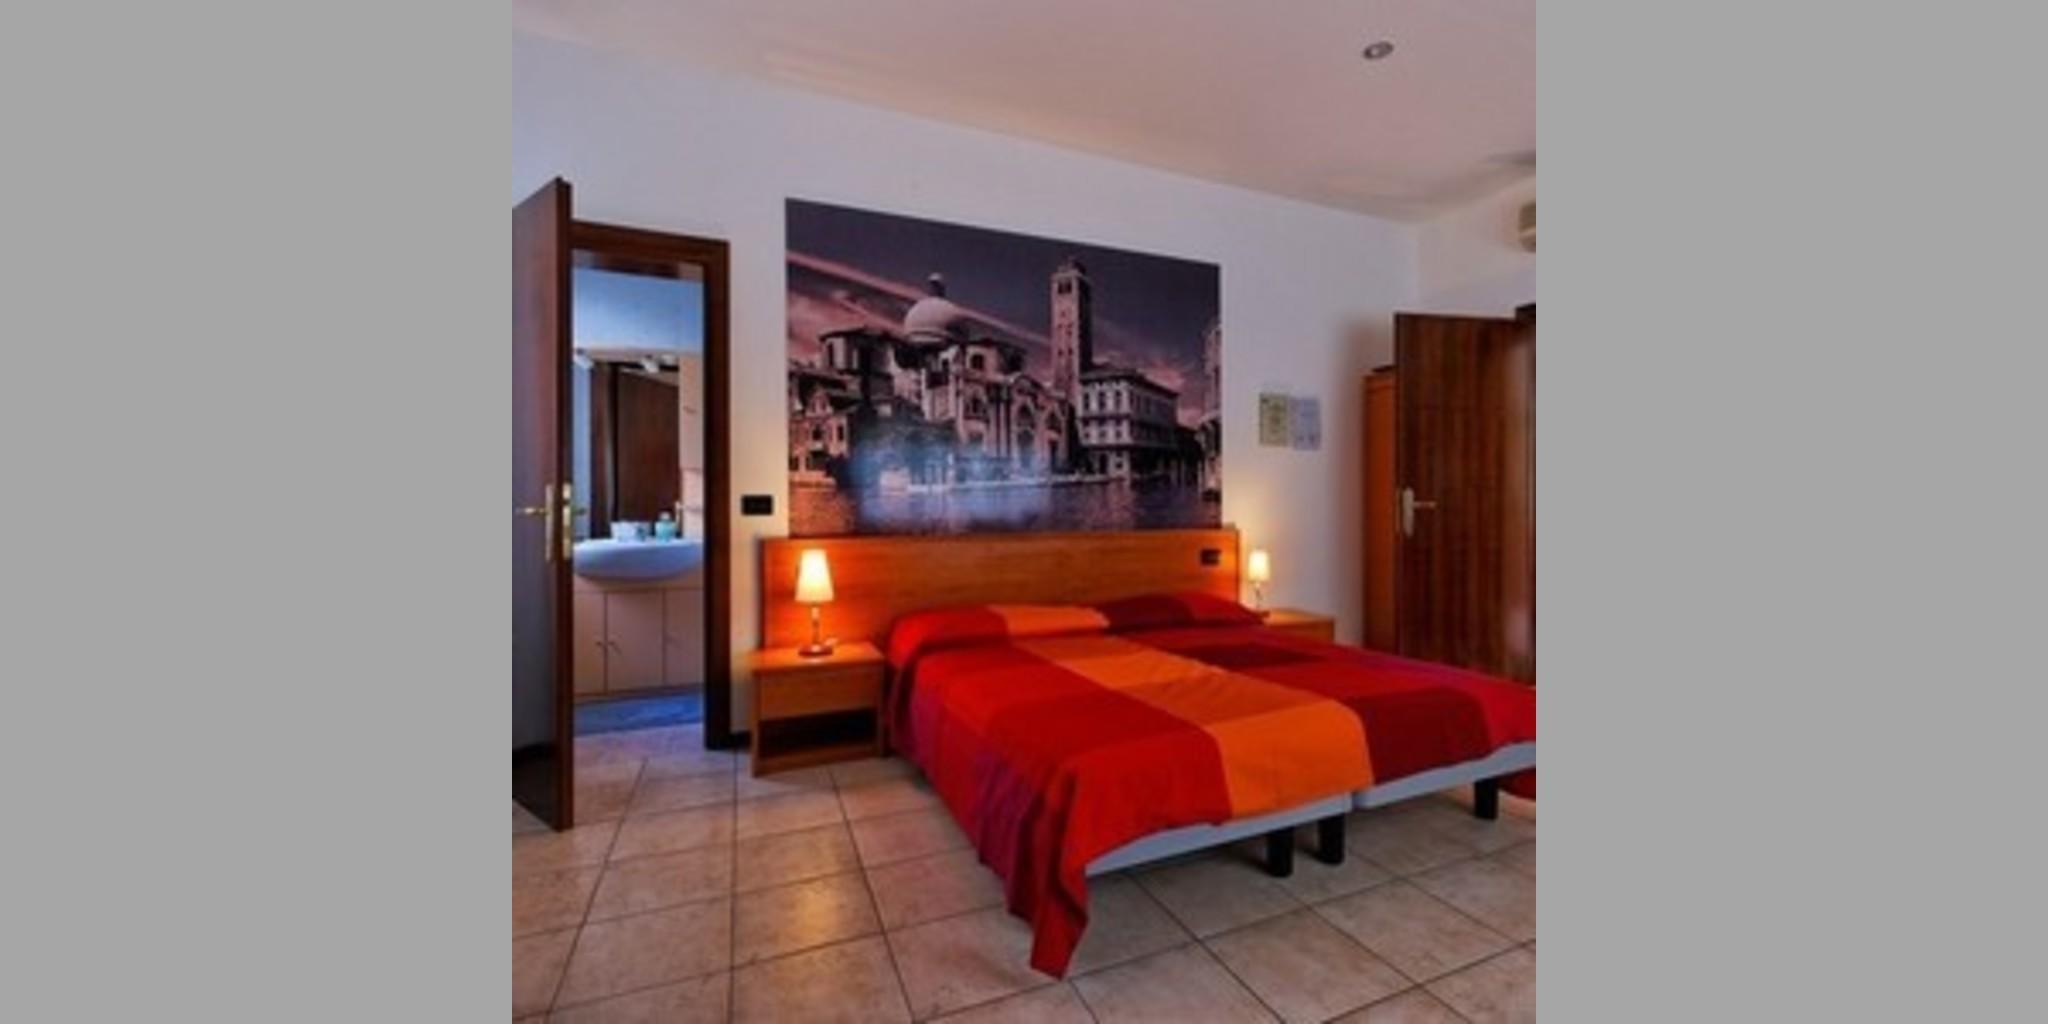 Appartement Venezia - Favaro Veneto